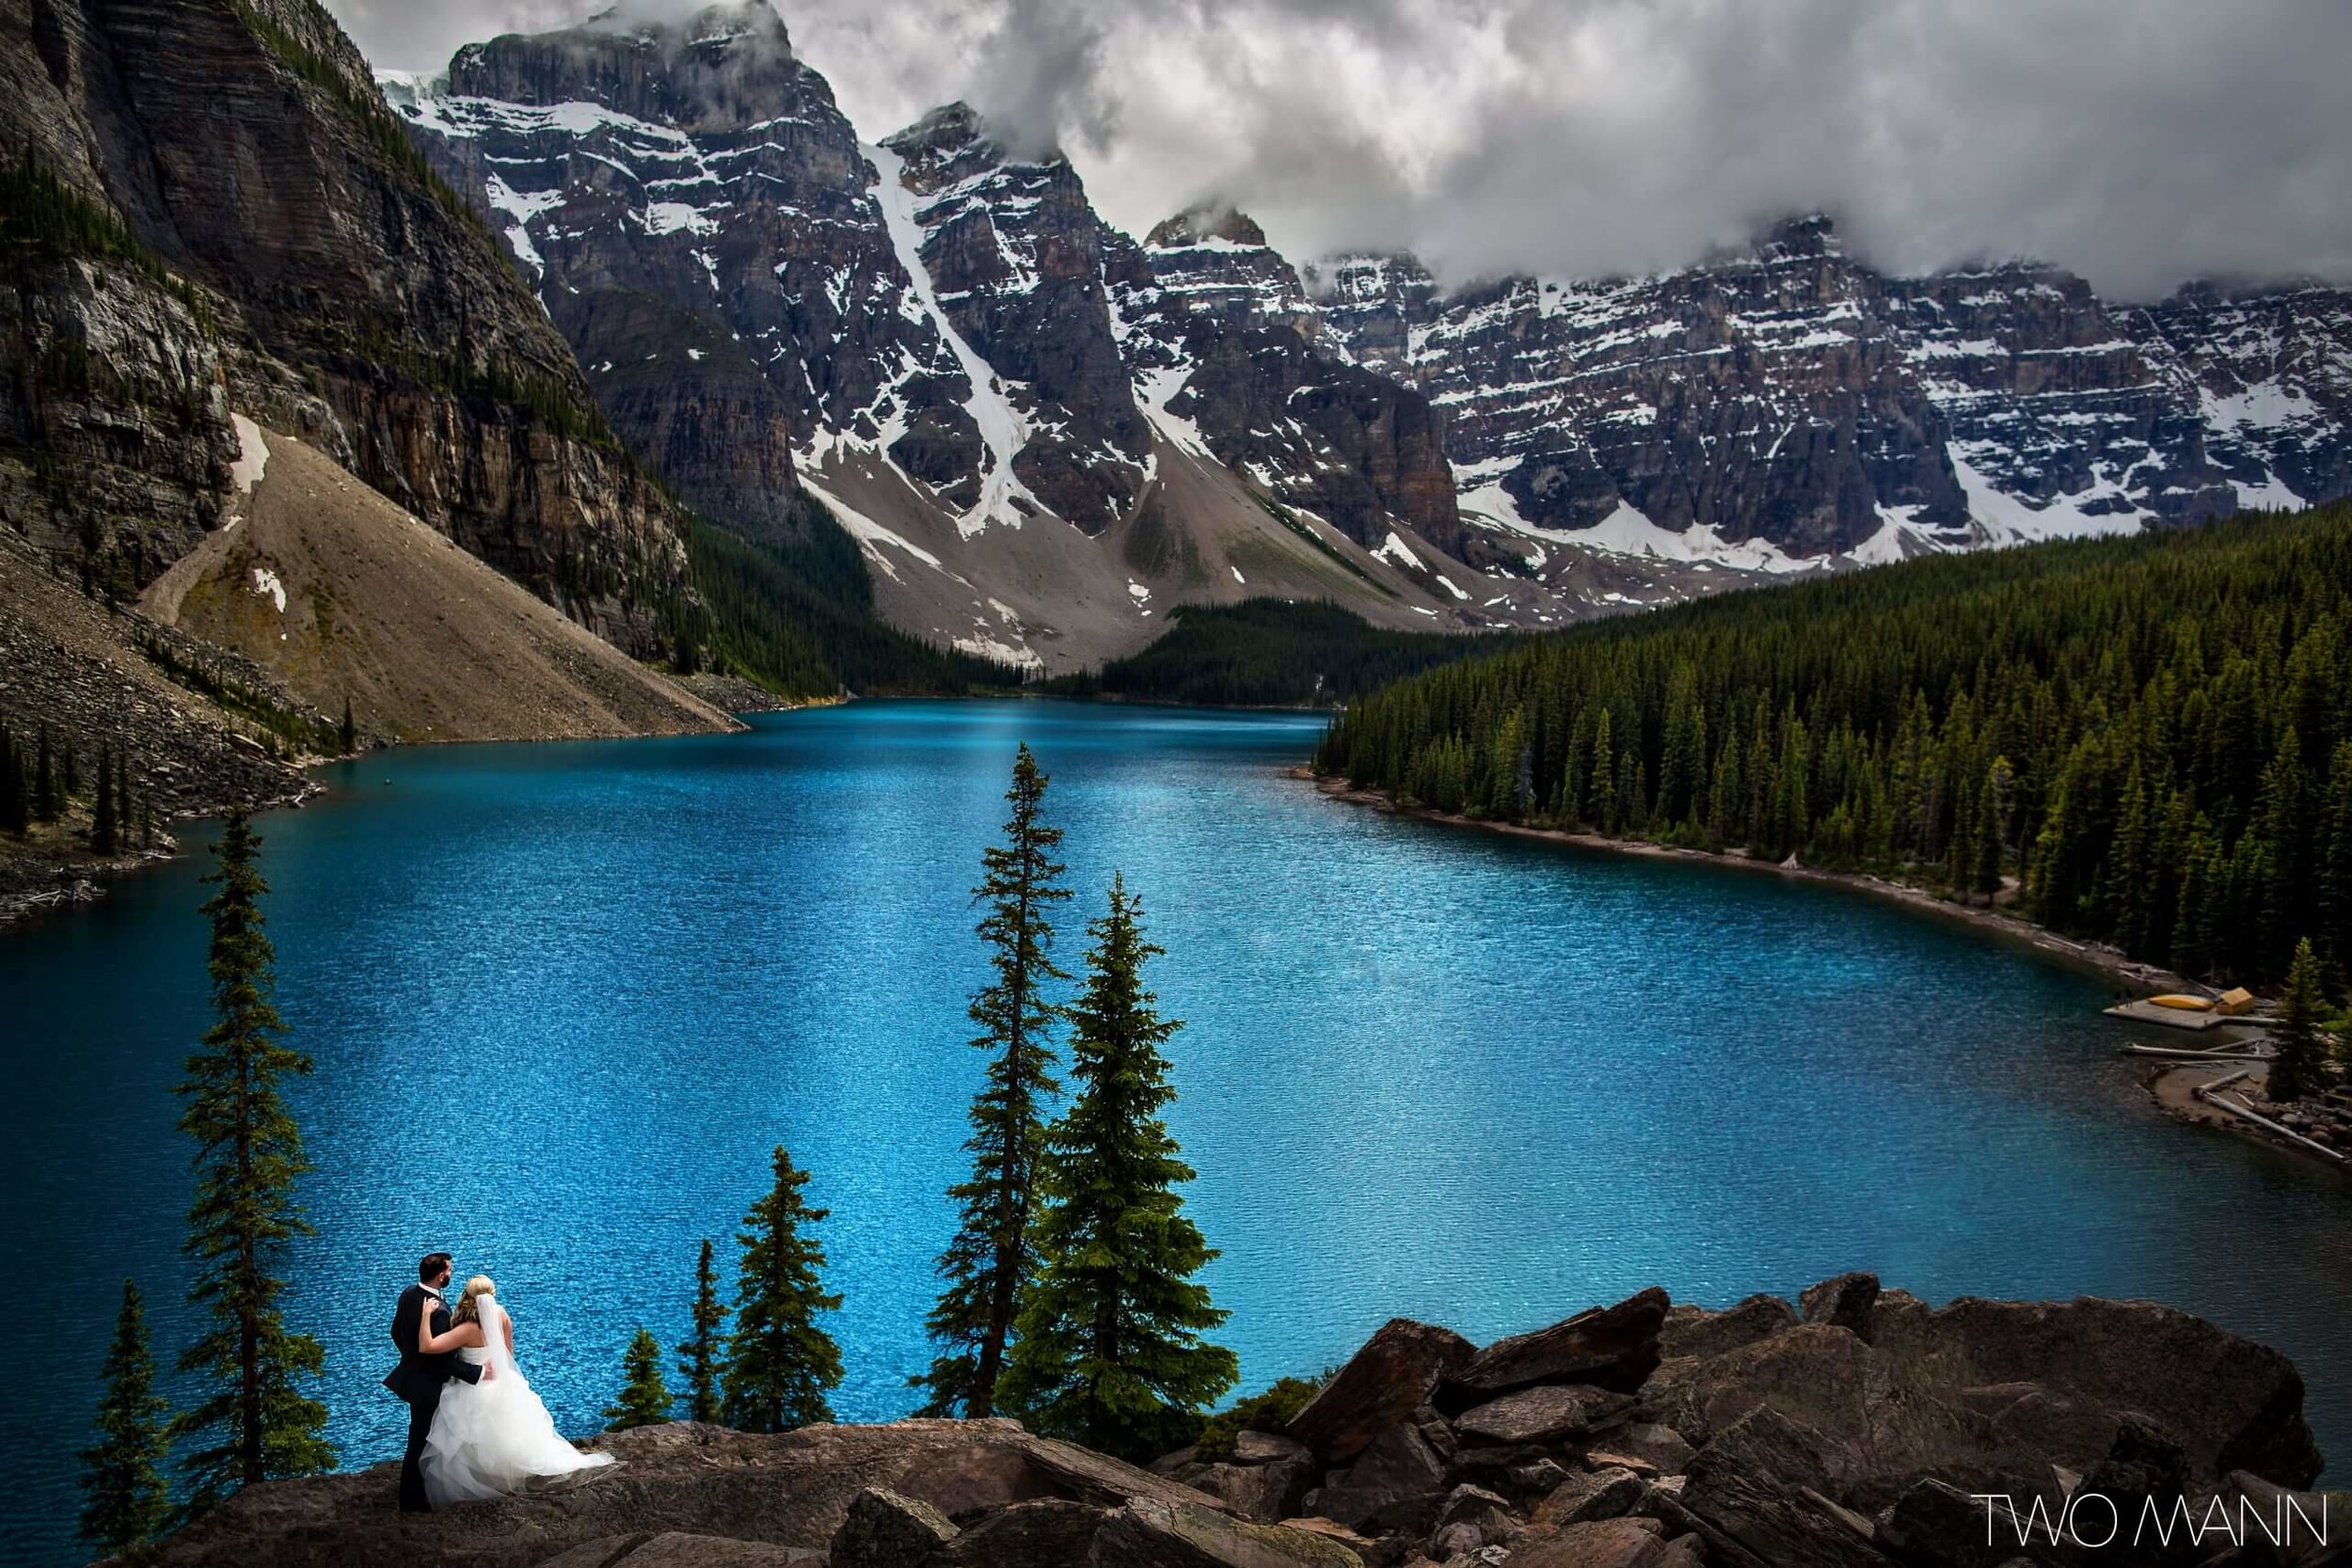 Two-Mann-Studios-Worlds-Best-Wedding-Photography-Best-of-2016-033-2560x1707.jpg